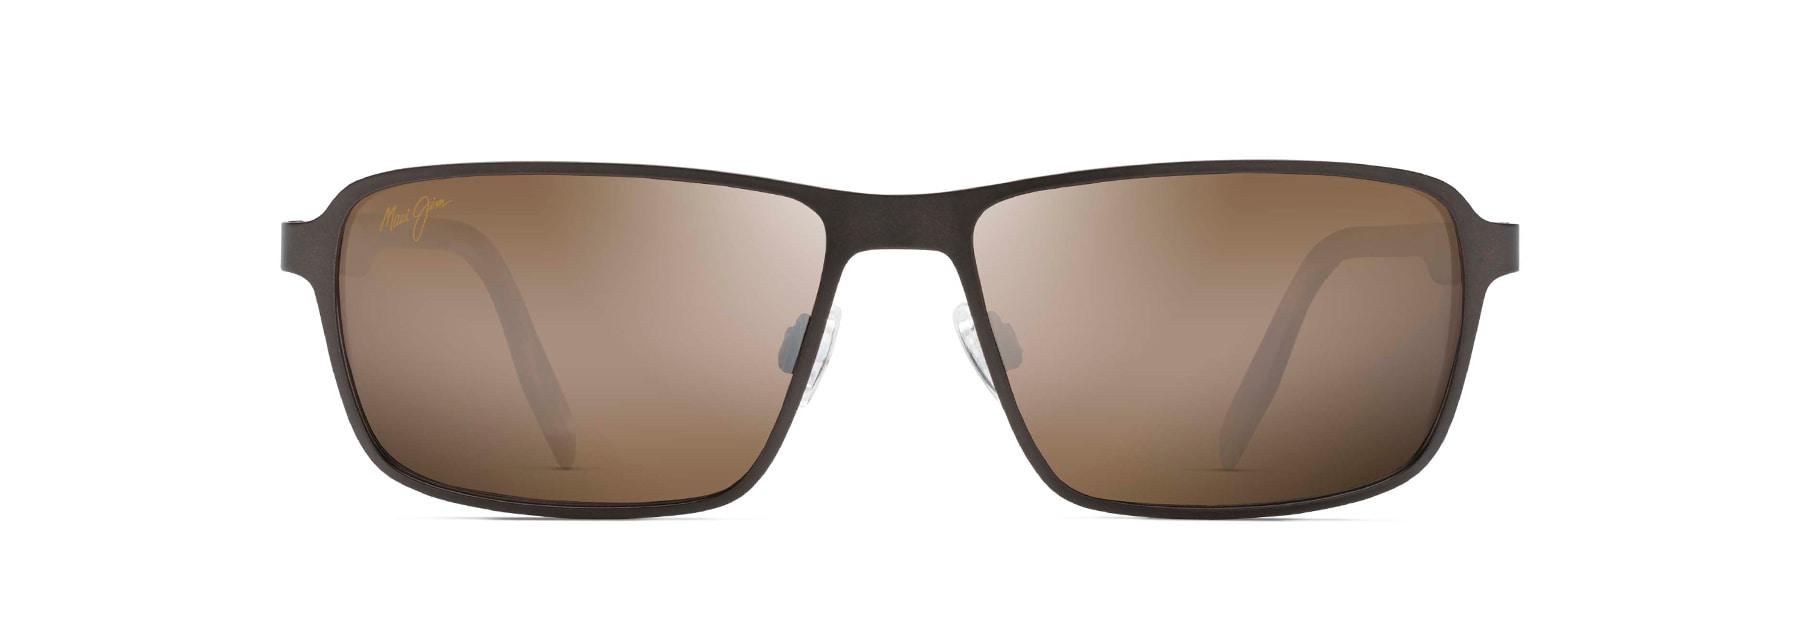 03167386955d GLASS BEACH. Polarized Rectangular Sunglasses